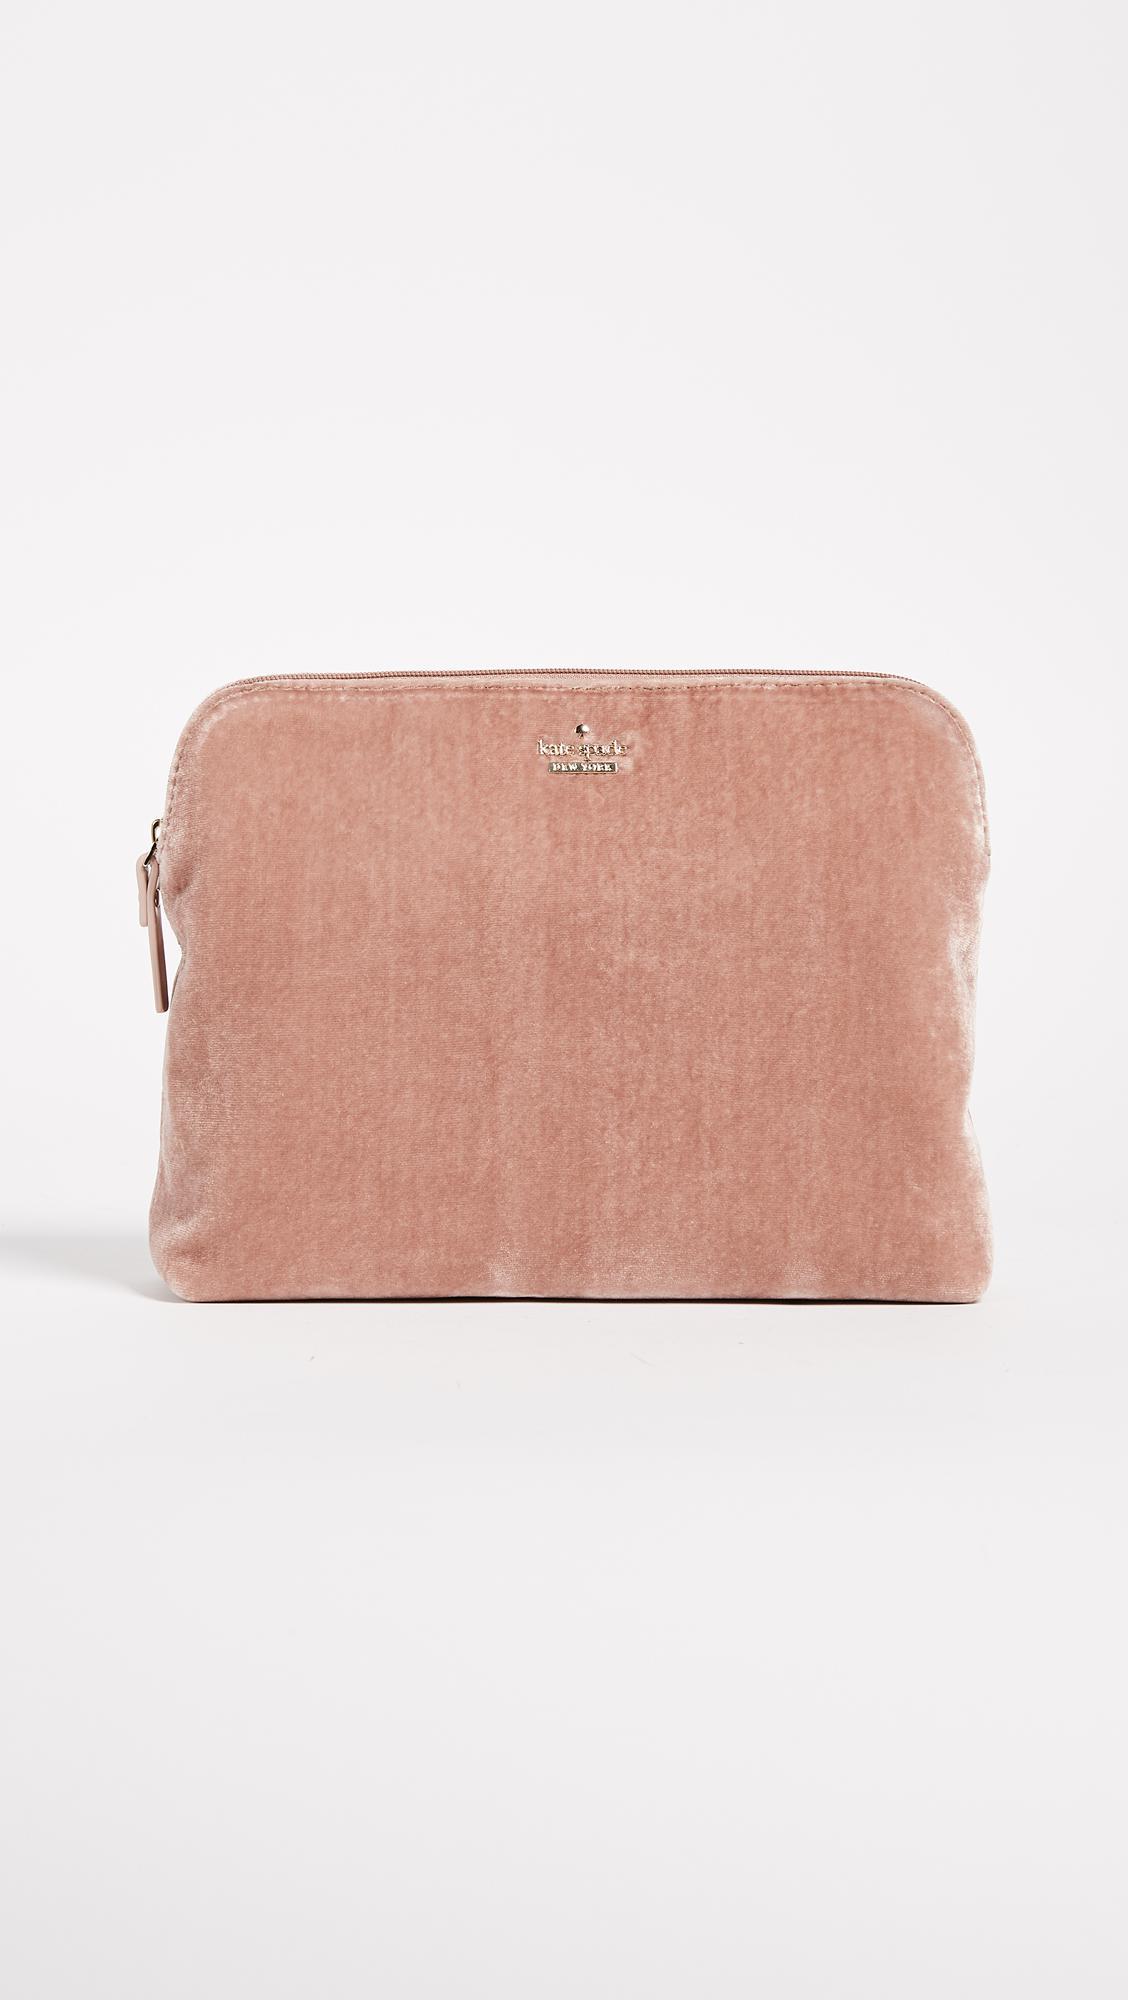 65235dfd05a5 Kate Spade Watson Lane Briley Velvet Makeup Bag in Pink - Lyst